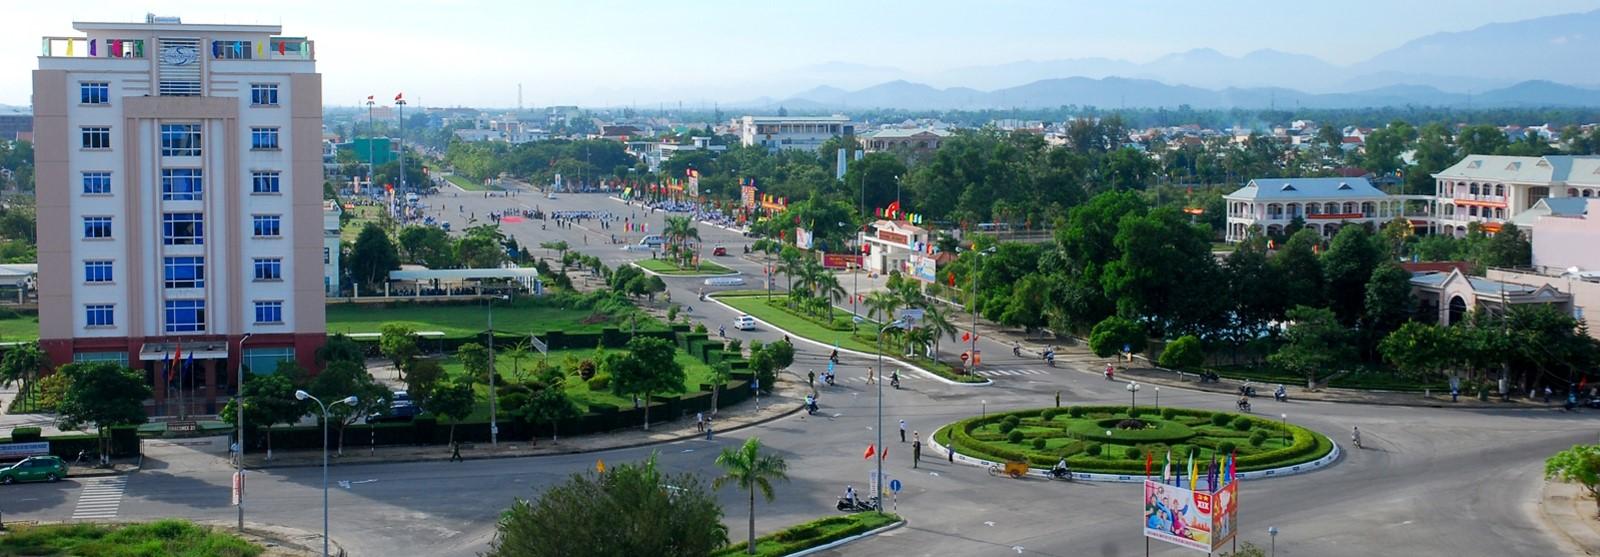 A corner of Tam Ky city. Photo: phuantien